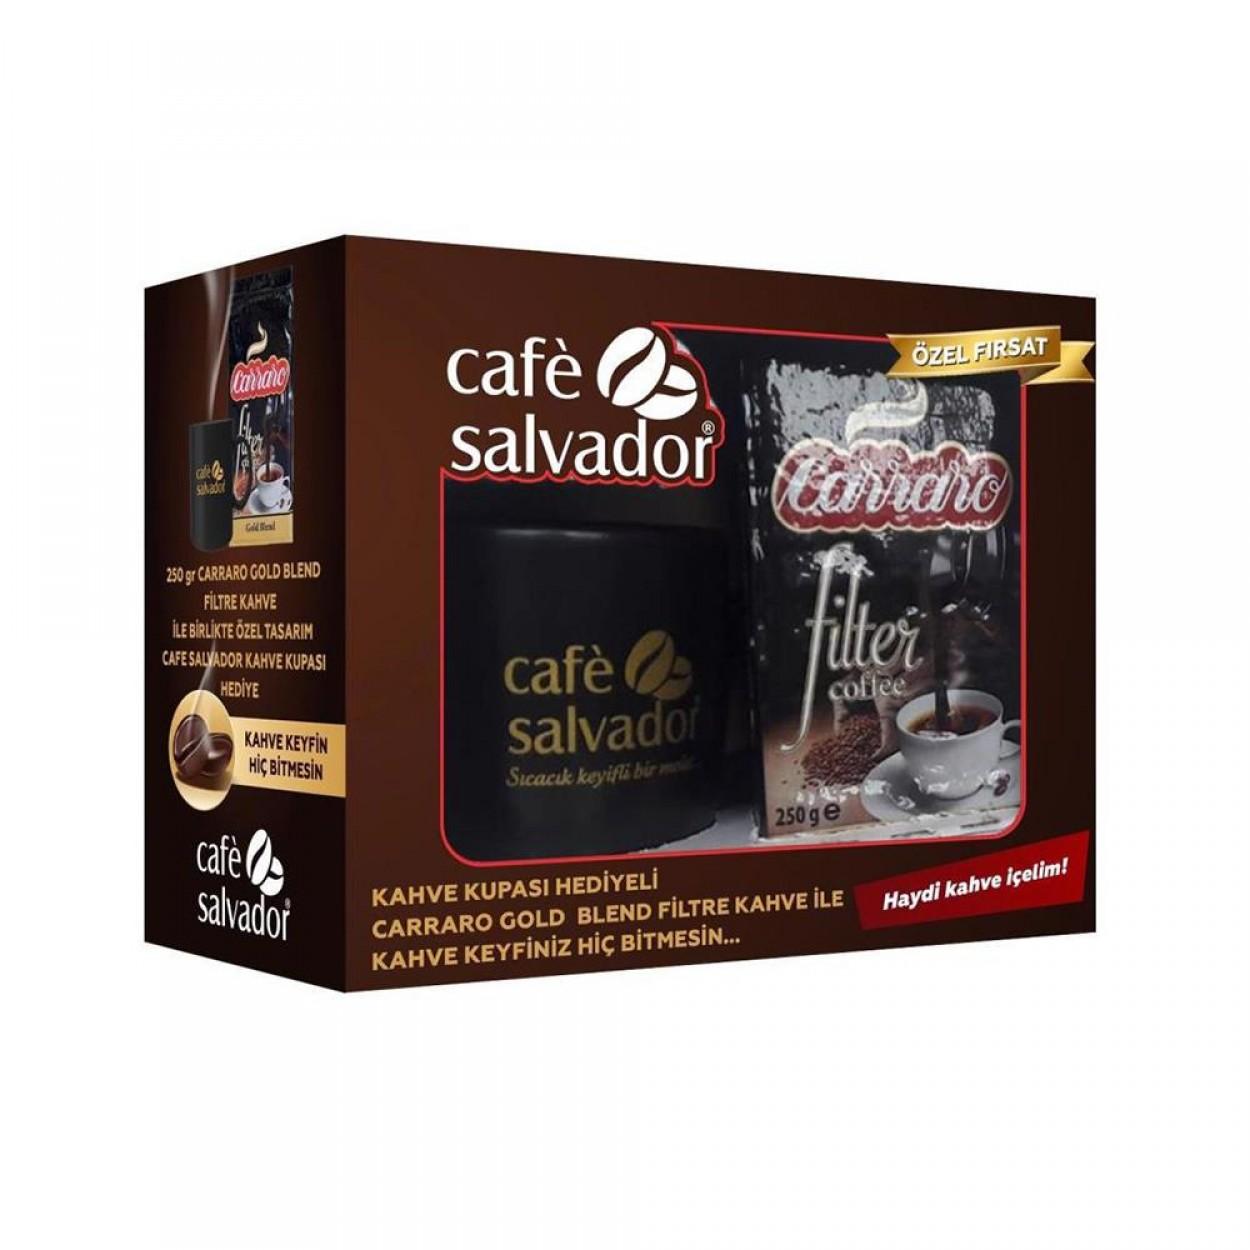 Café Salvador Carraro Gold Blend Filtre Kahve 250 gr.Kupa Hediyeli